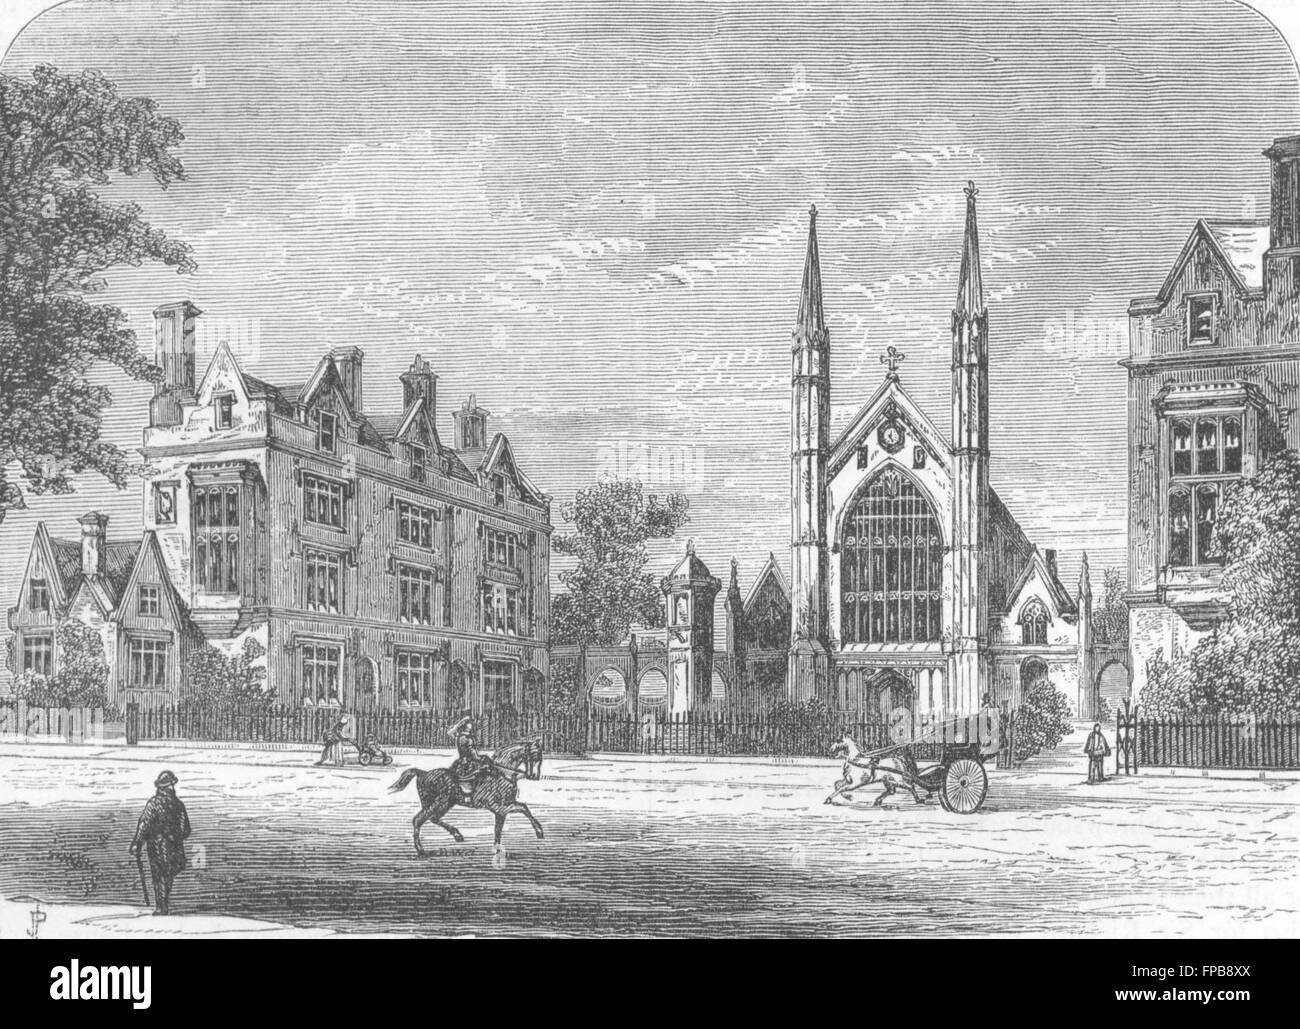 London Regent S Park St Katharine S Hospital Antique Print 1880 Stock Photo Alamy